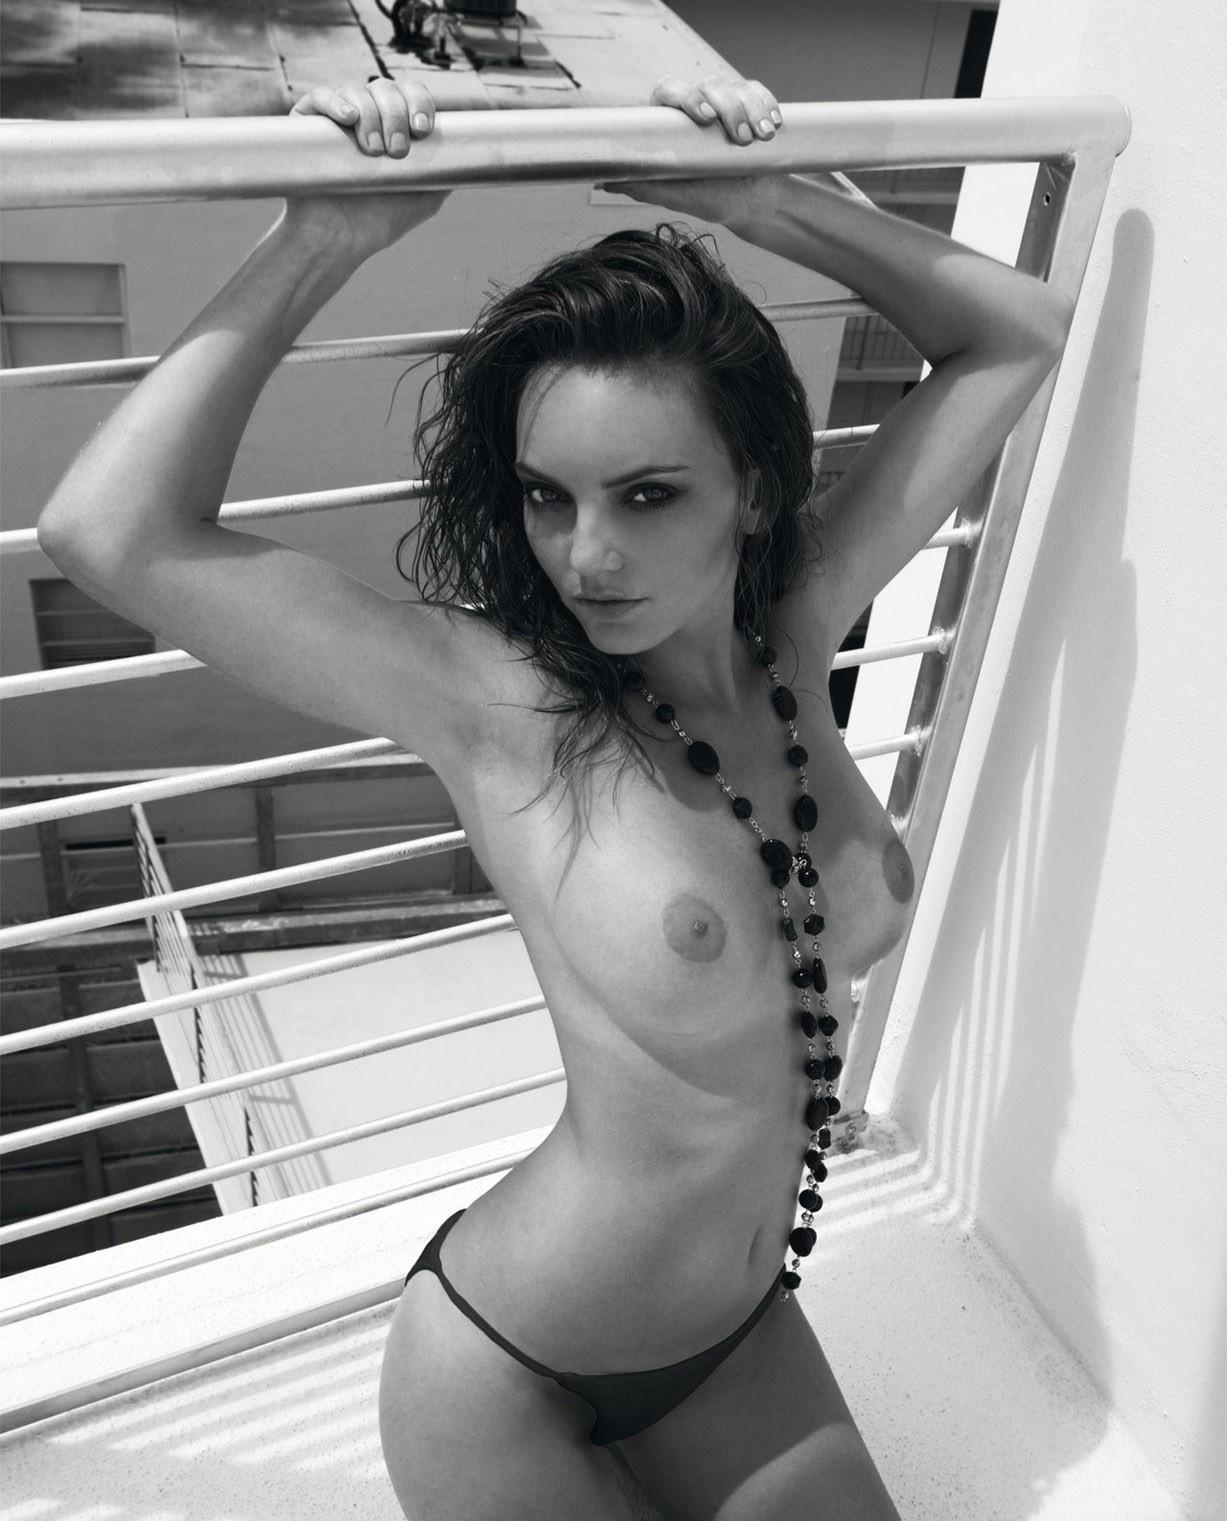 Berner Group erotic calendar 2009 - Hight Performance